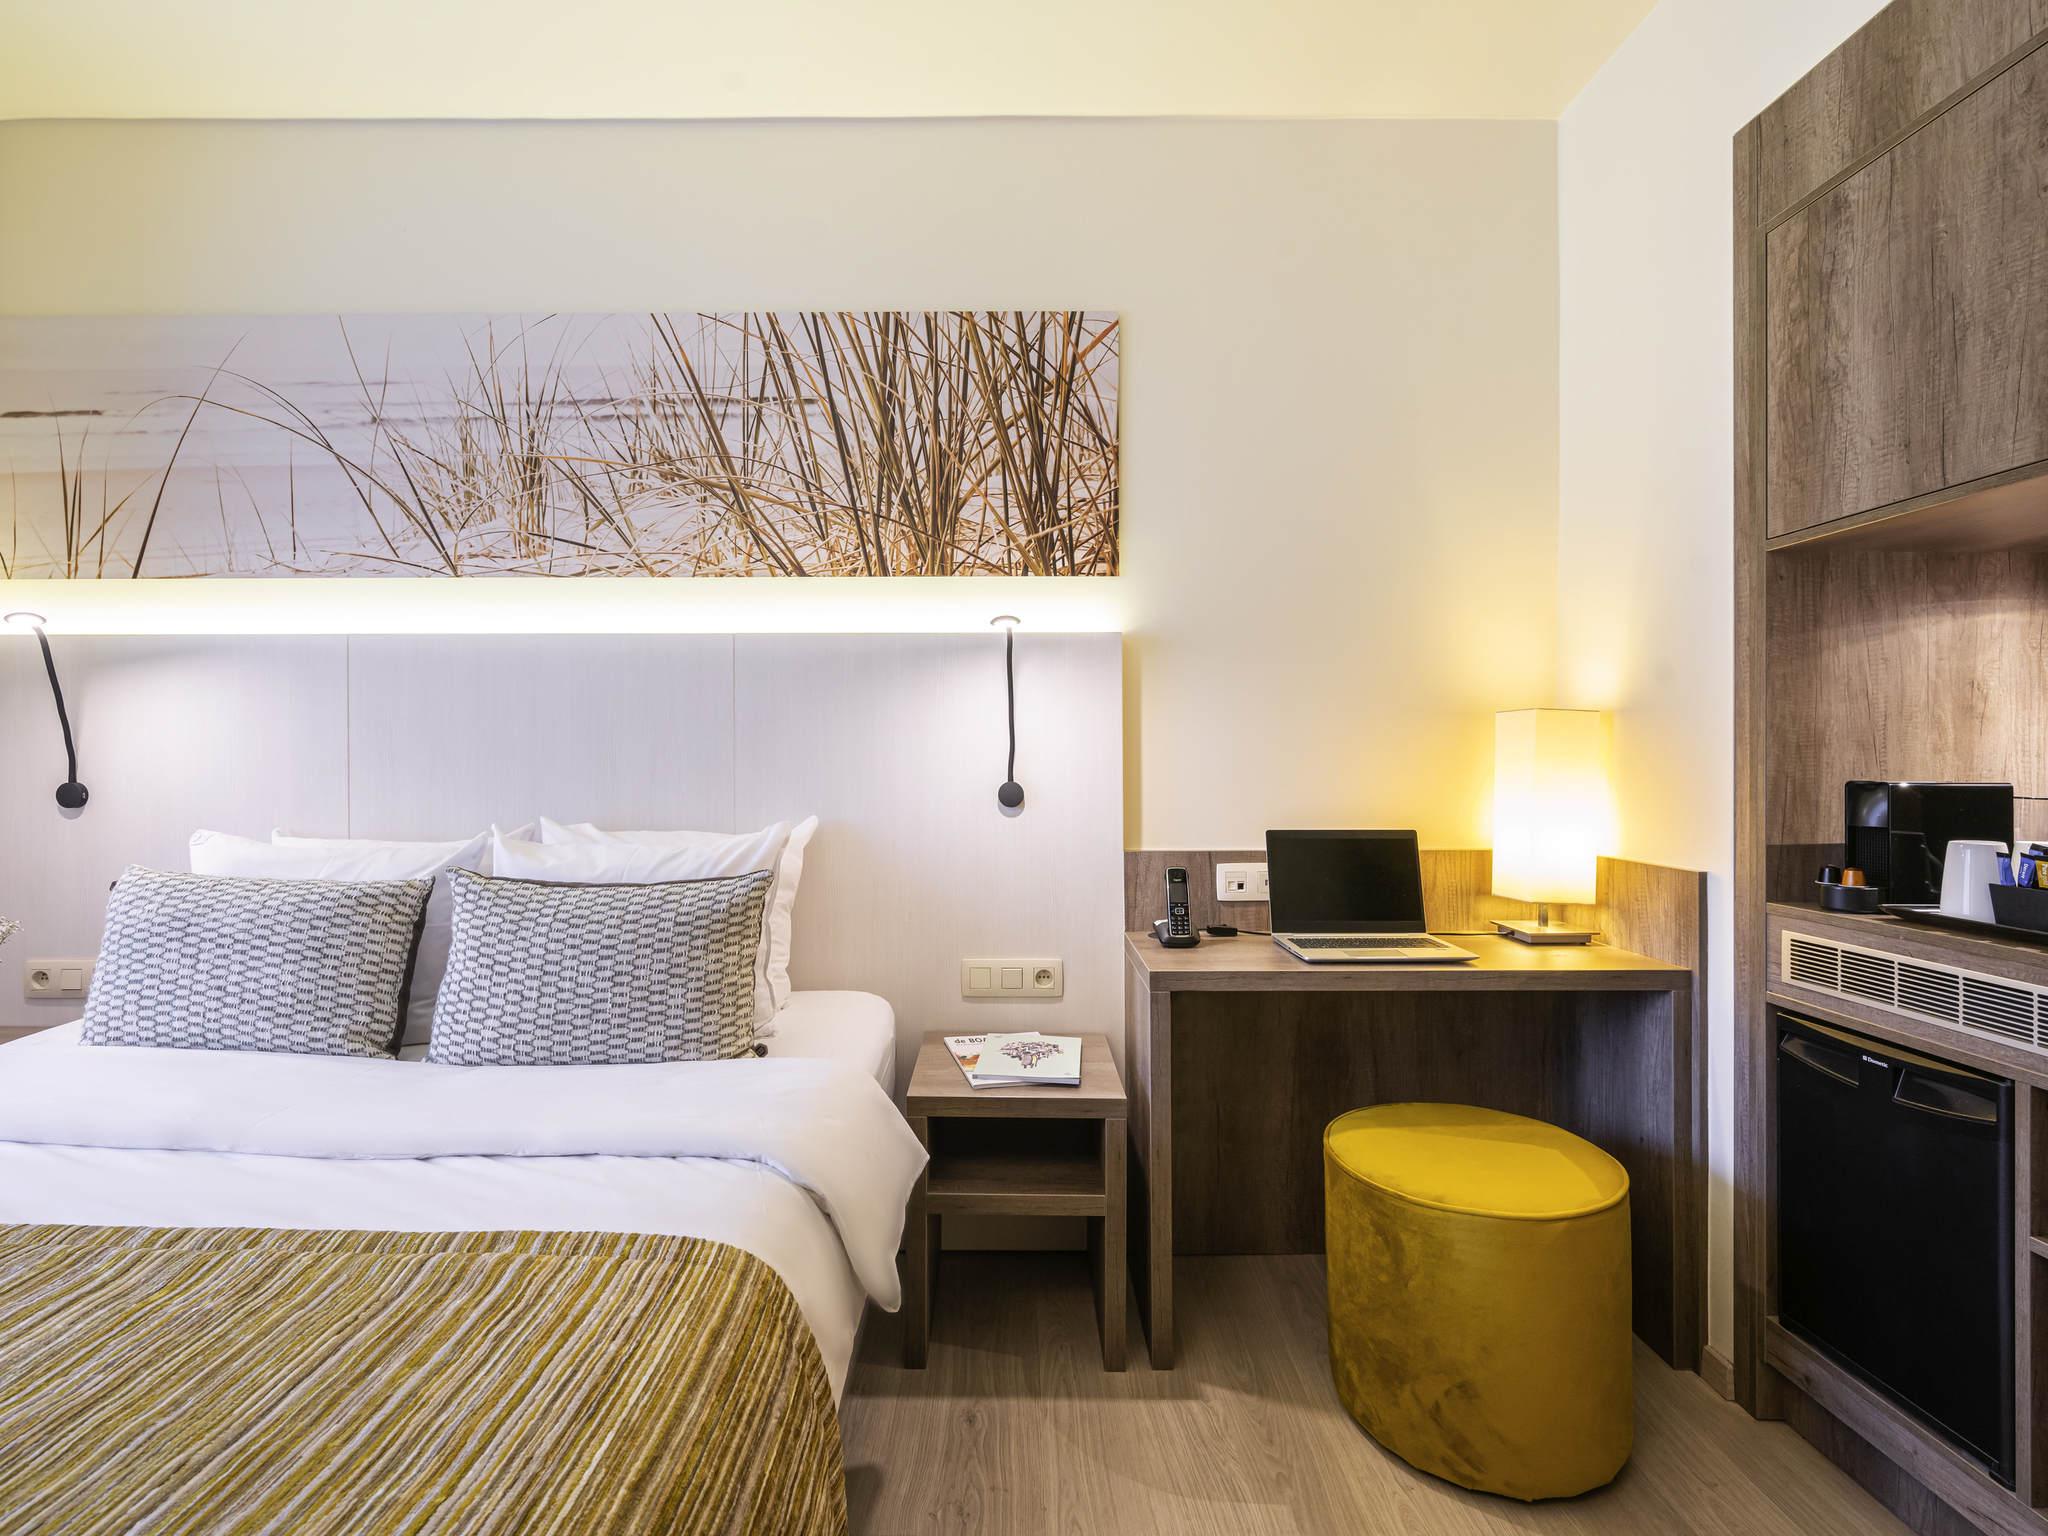 ostend noel 2018 Beach Hotel Ostend   Mercure Hotels   Near Airport ostend noel 2018